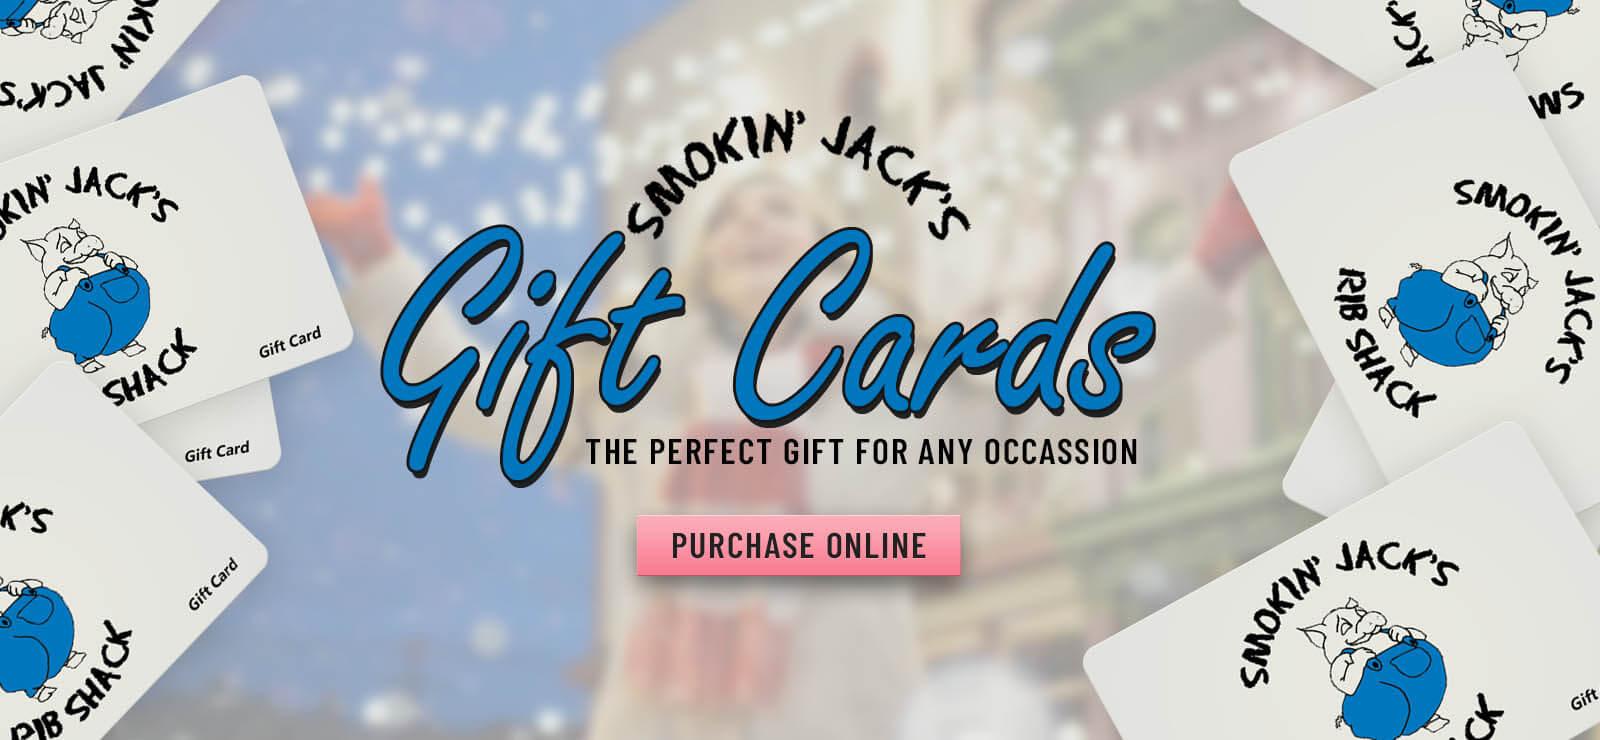 Smokin' Jack's Rib Shack - Gift Cards